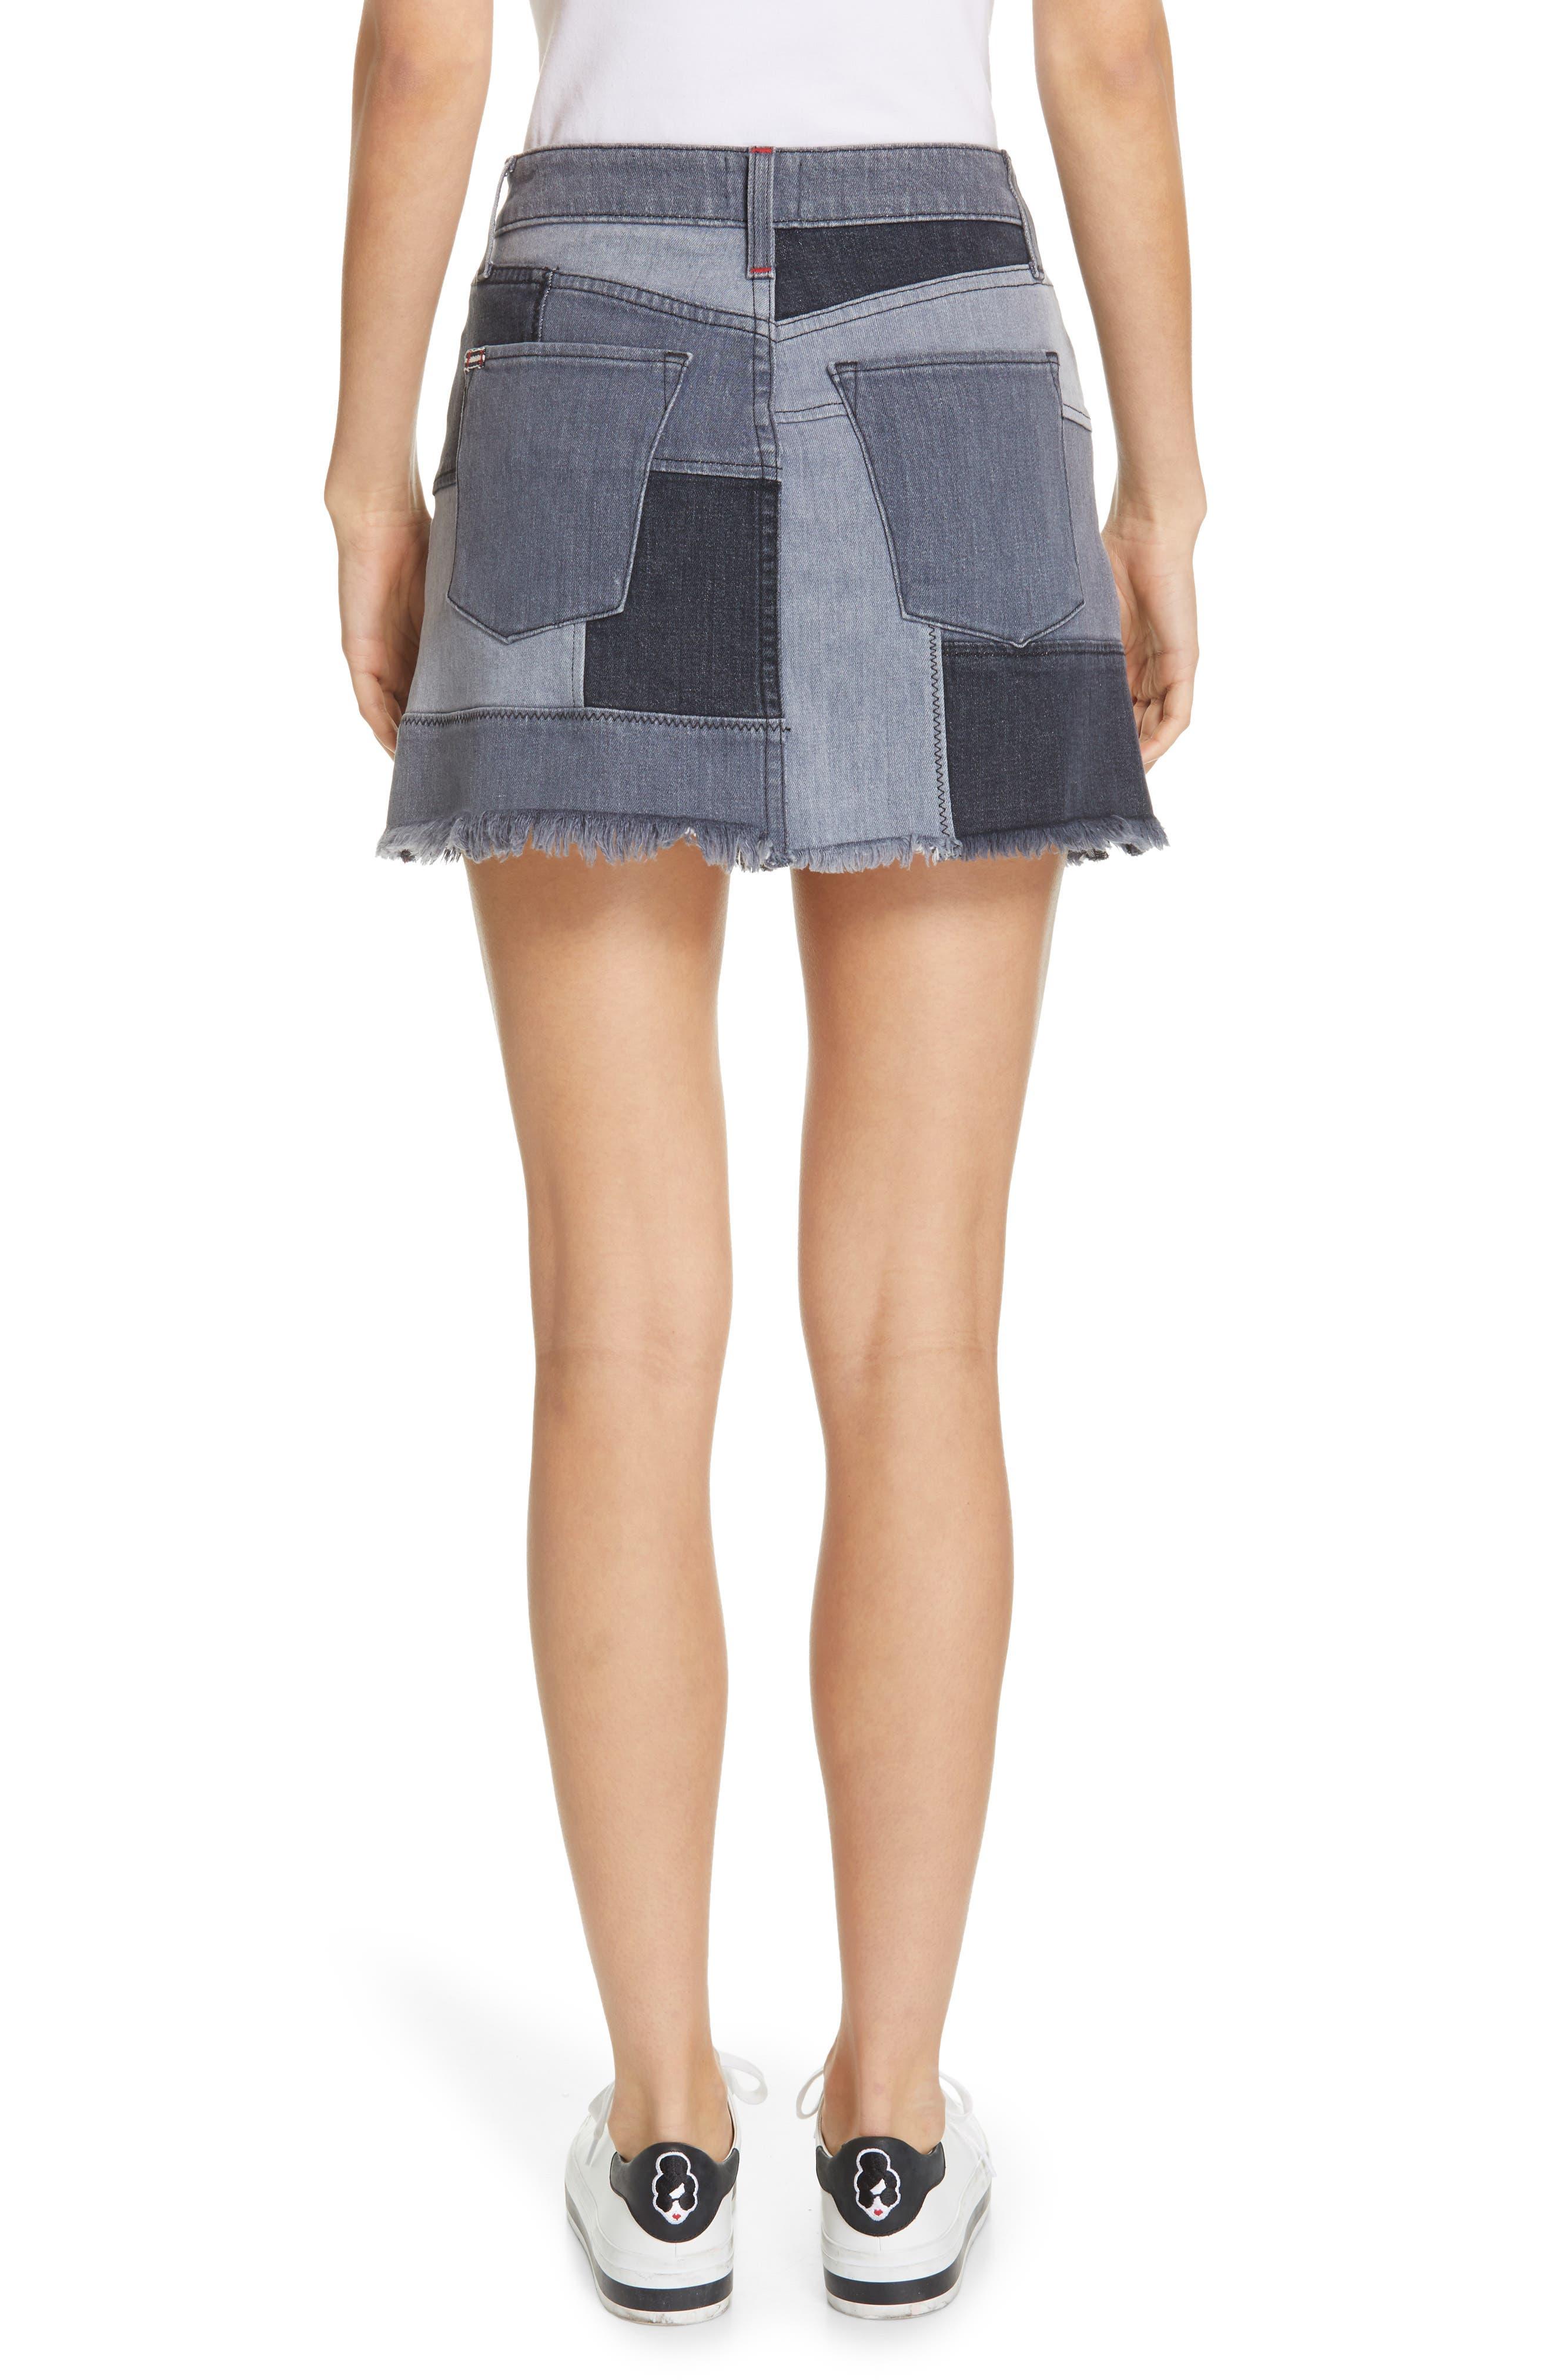 ALICE + OLIVIA JEANS,                             Amazing Patchwork Denim Miniskirt,                             Alternate thumbnail 2, color,                             NIGHT SKY